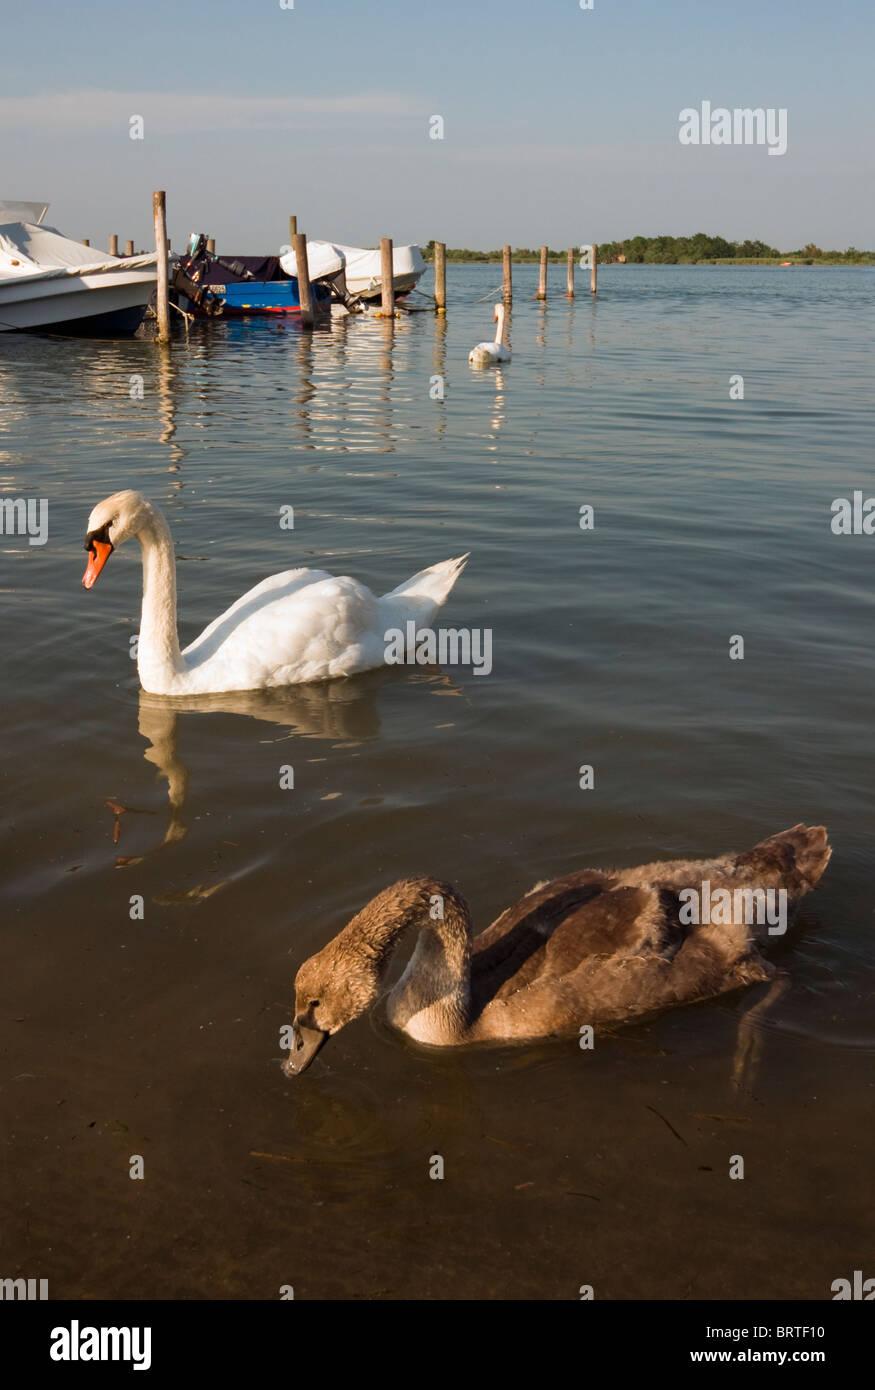 Mute Swans (Cygnus olor) - Adult and Juvenile (with Brown Plumage) in Laguna di Caorle (Caorle Lagoon), Veneto, - Stock Image